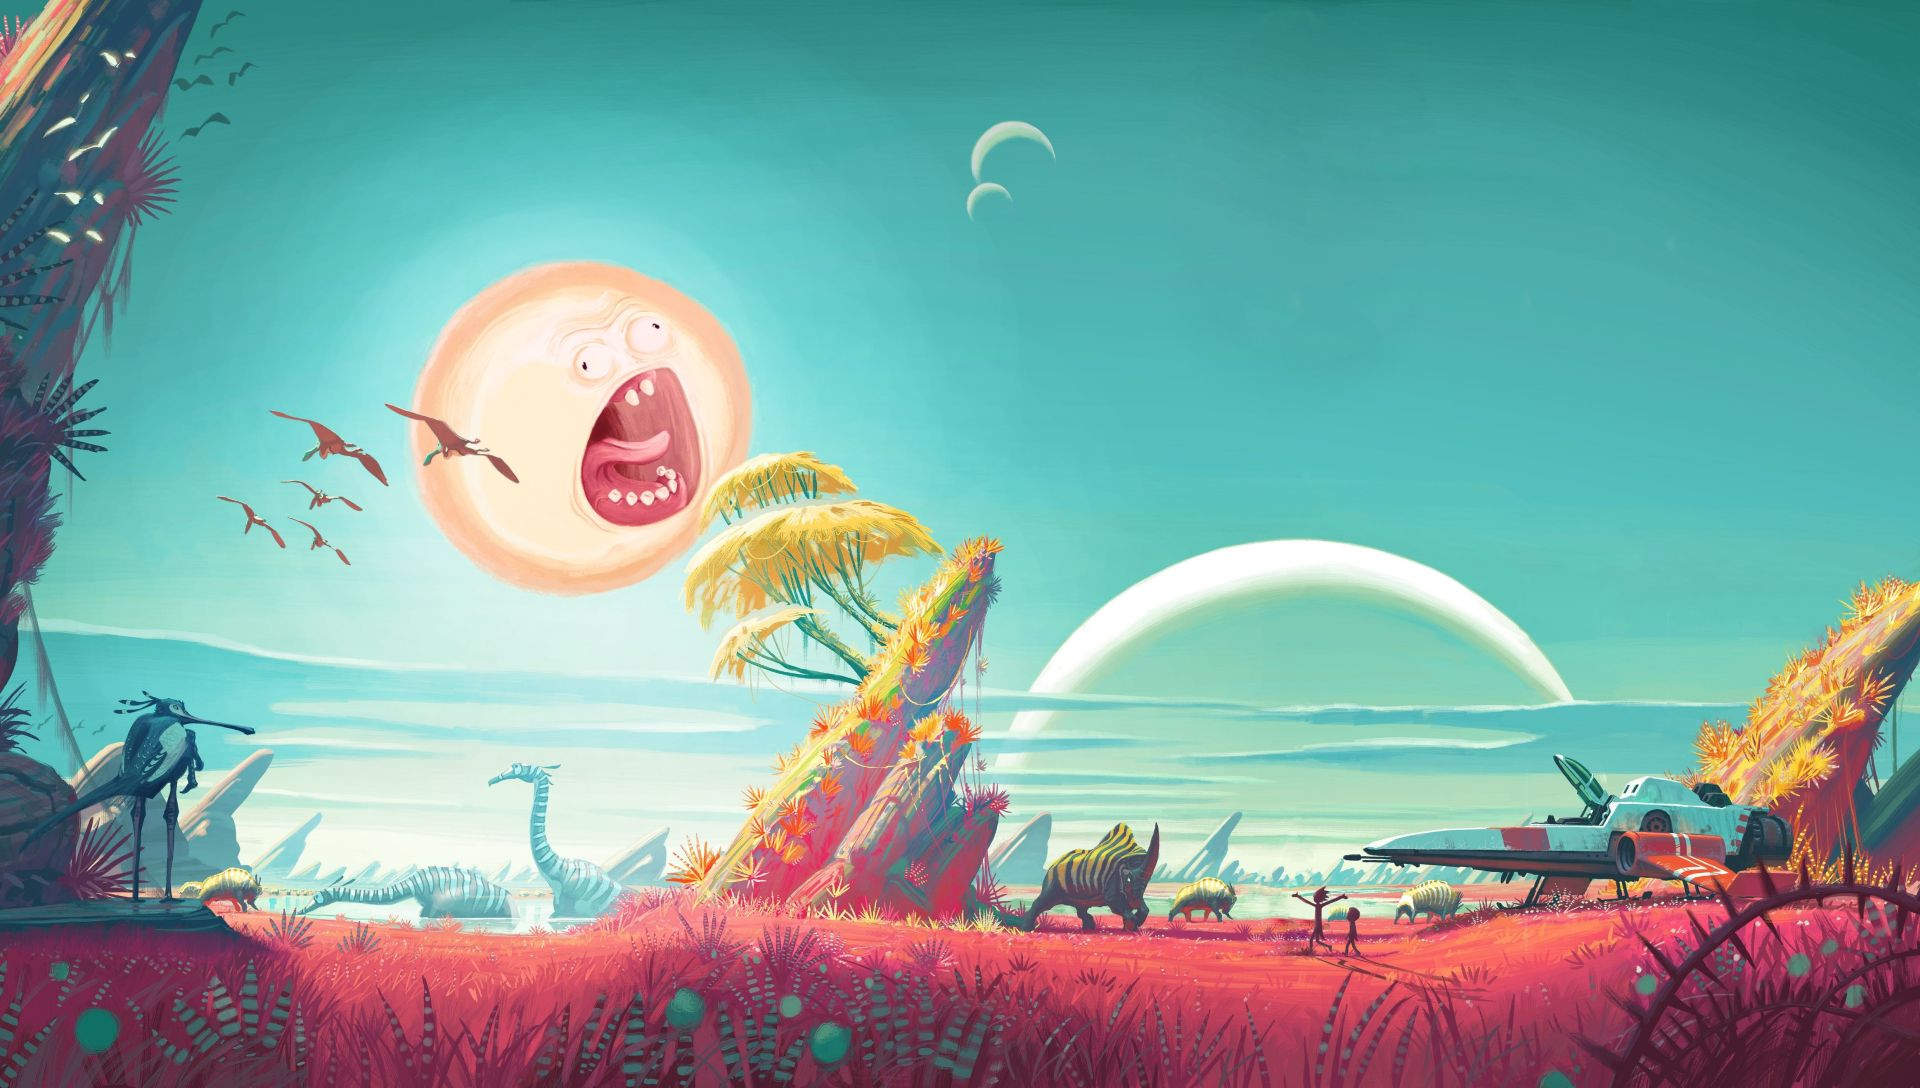 Rick and Morty Screaming Sun wallpaper